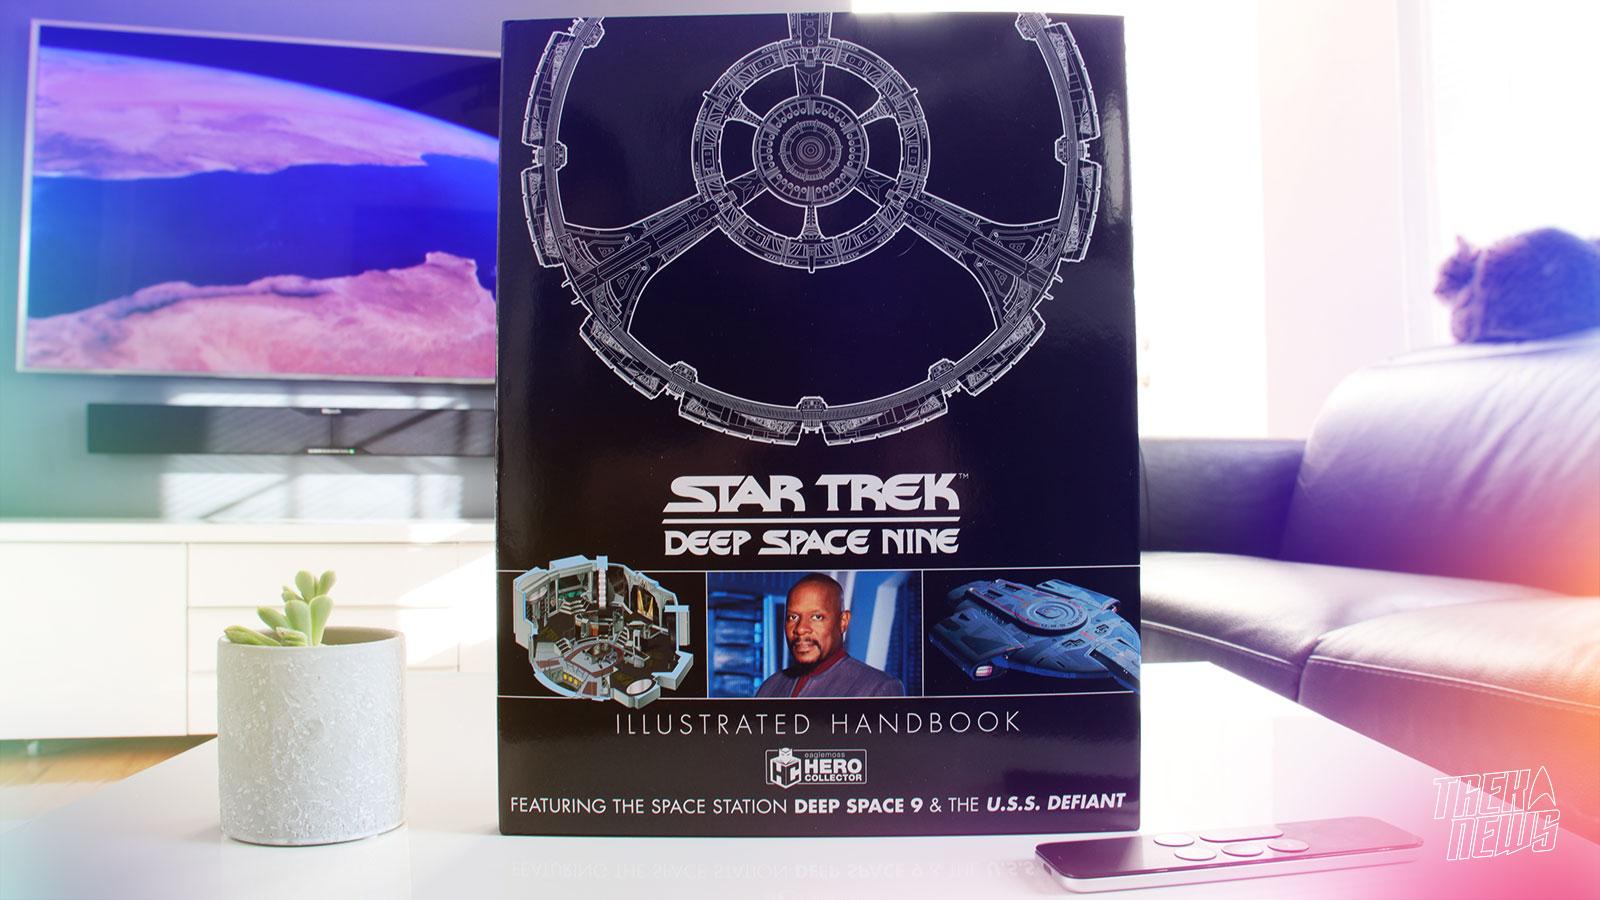 Star Trek: Deep Space Nine Illustrated Handbook Review: Terok Nor Deconstructed In Amazing Detail